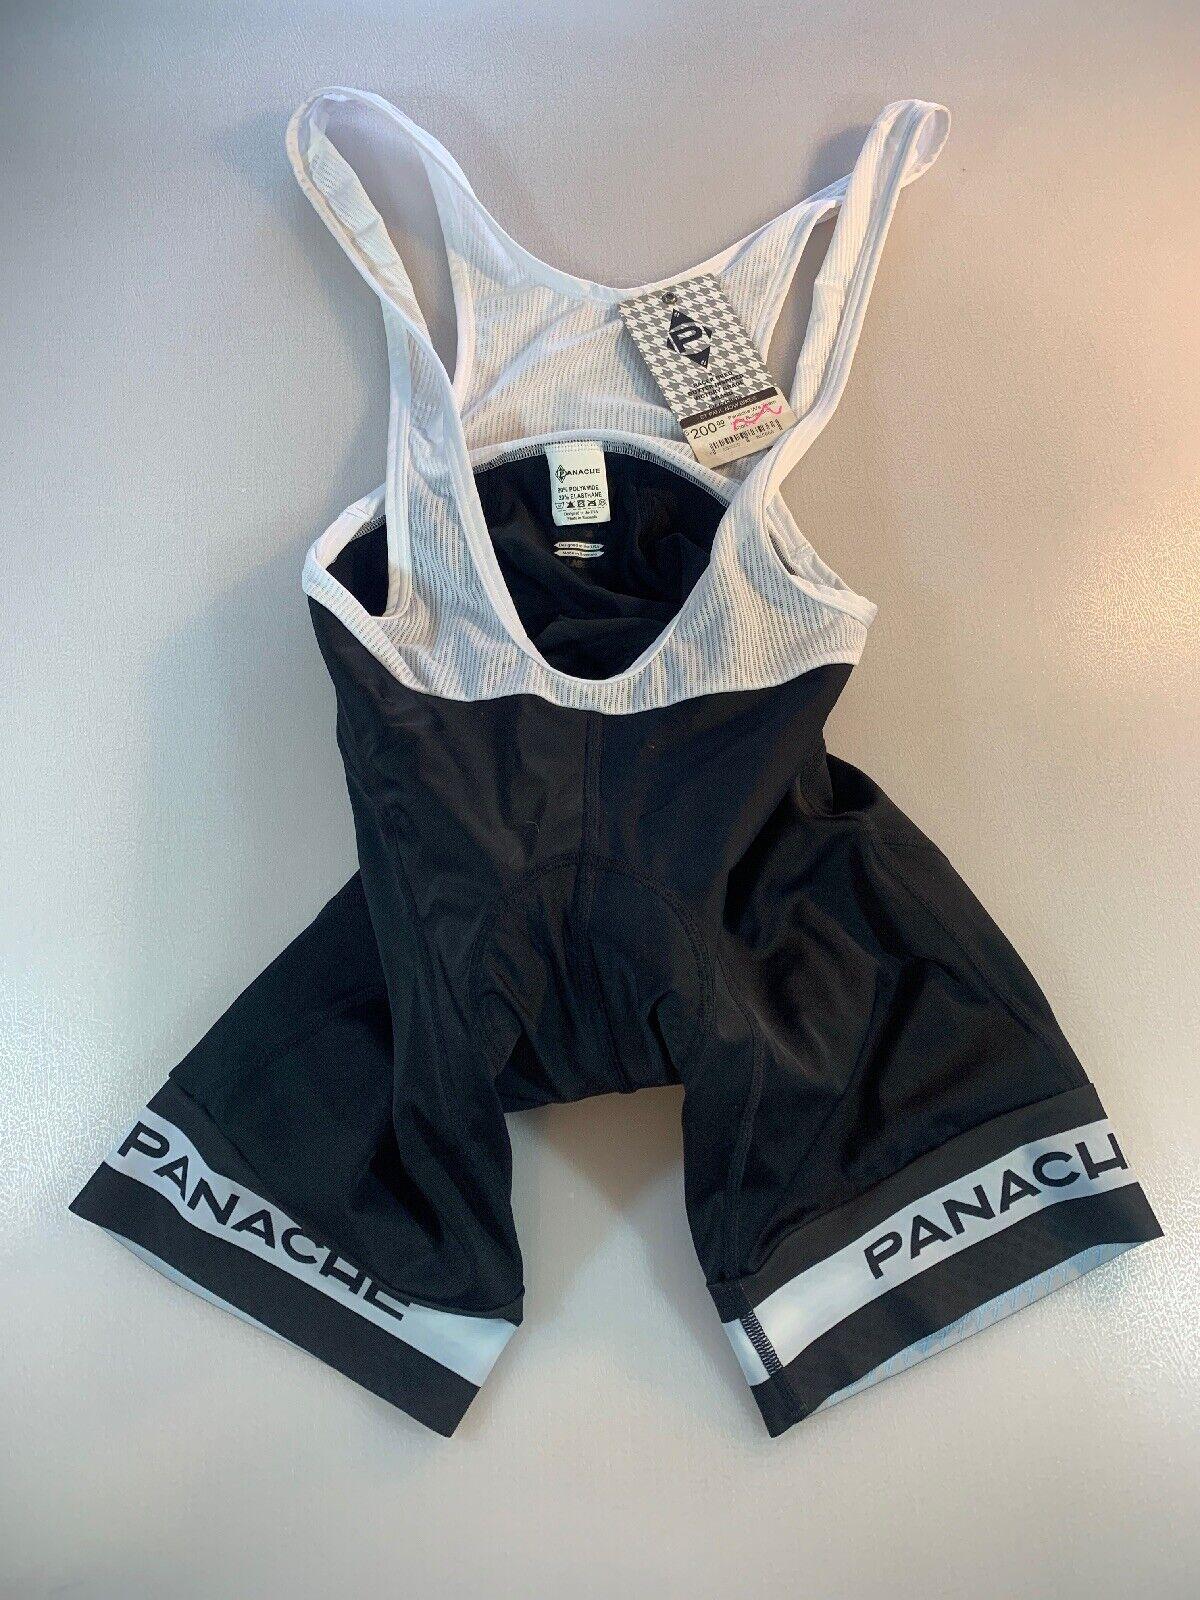 Panache Womens Team Issue Cycling Bib  Shorts Large L (6570-19)  for cheap